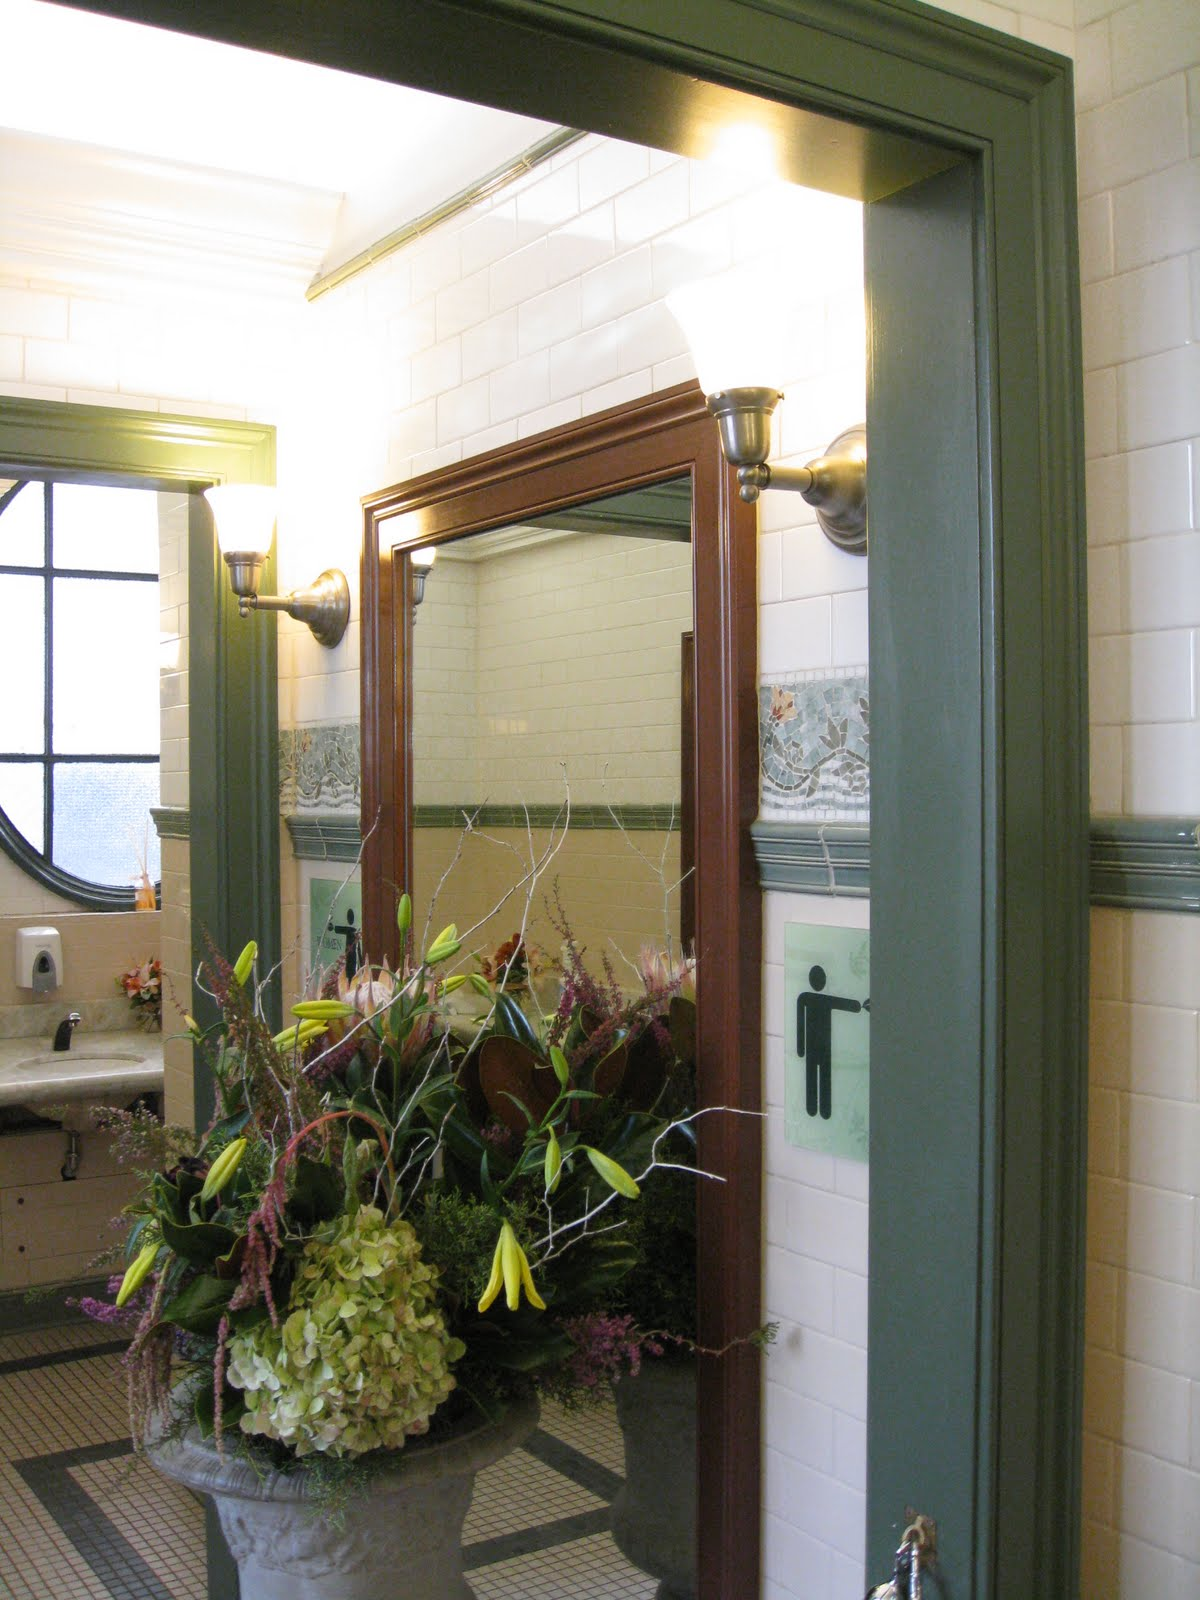 Bryant Park Blog: Vote for Bryant Park's Bathrooms!